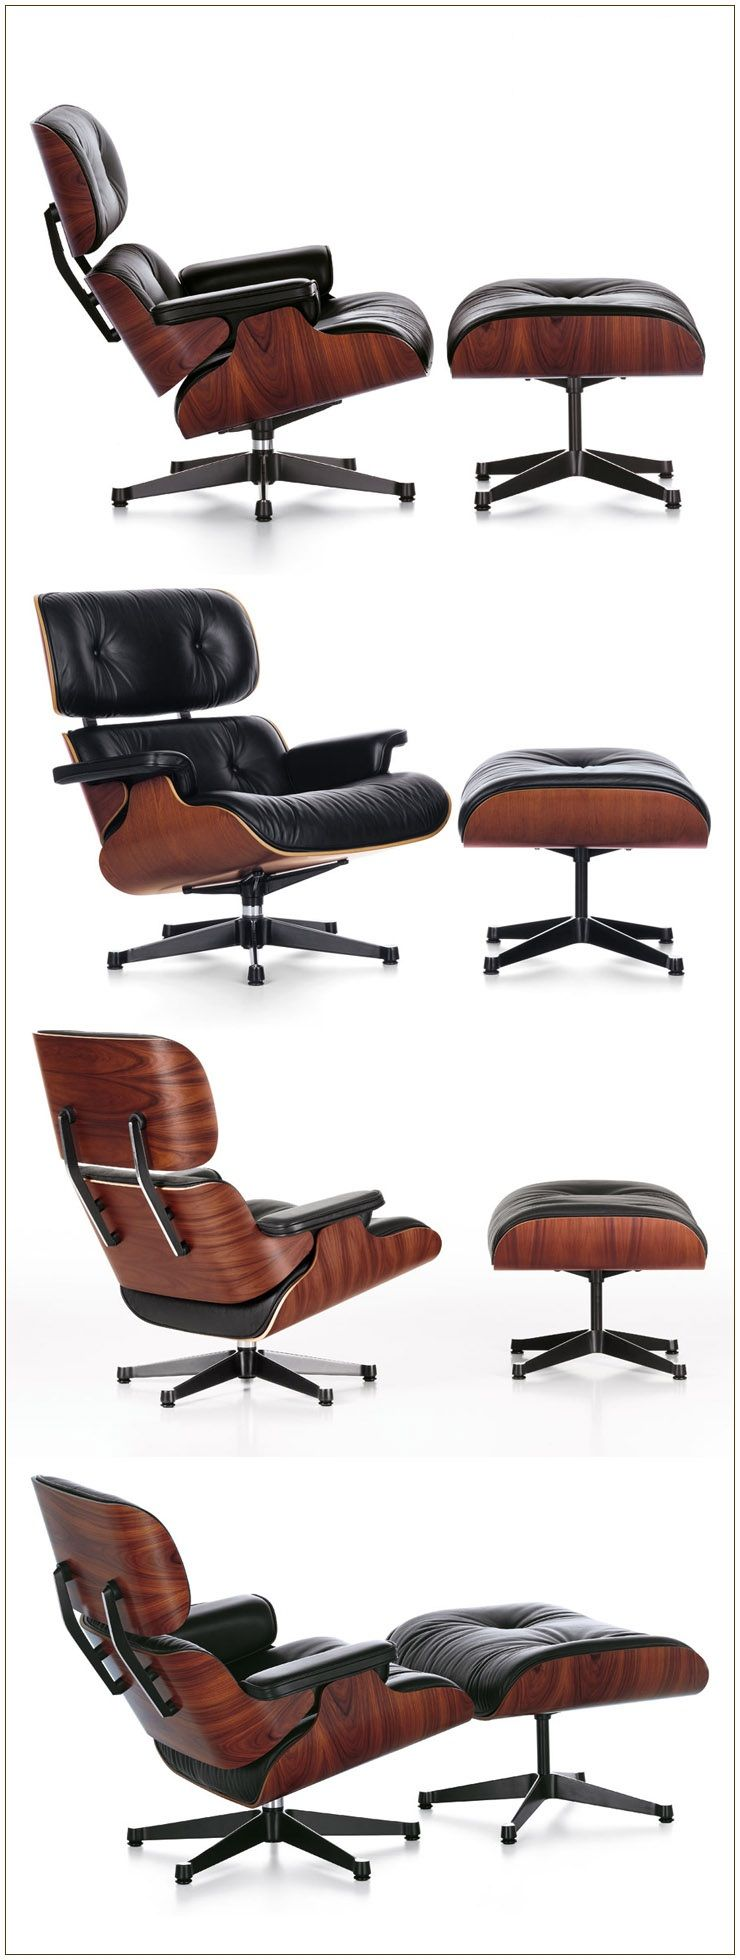 Lounge Chair / Charles Eames / 1956